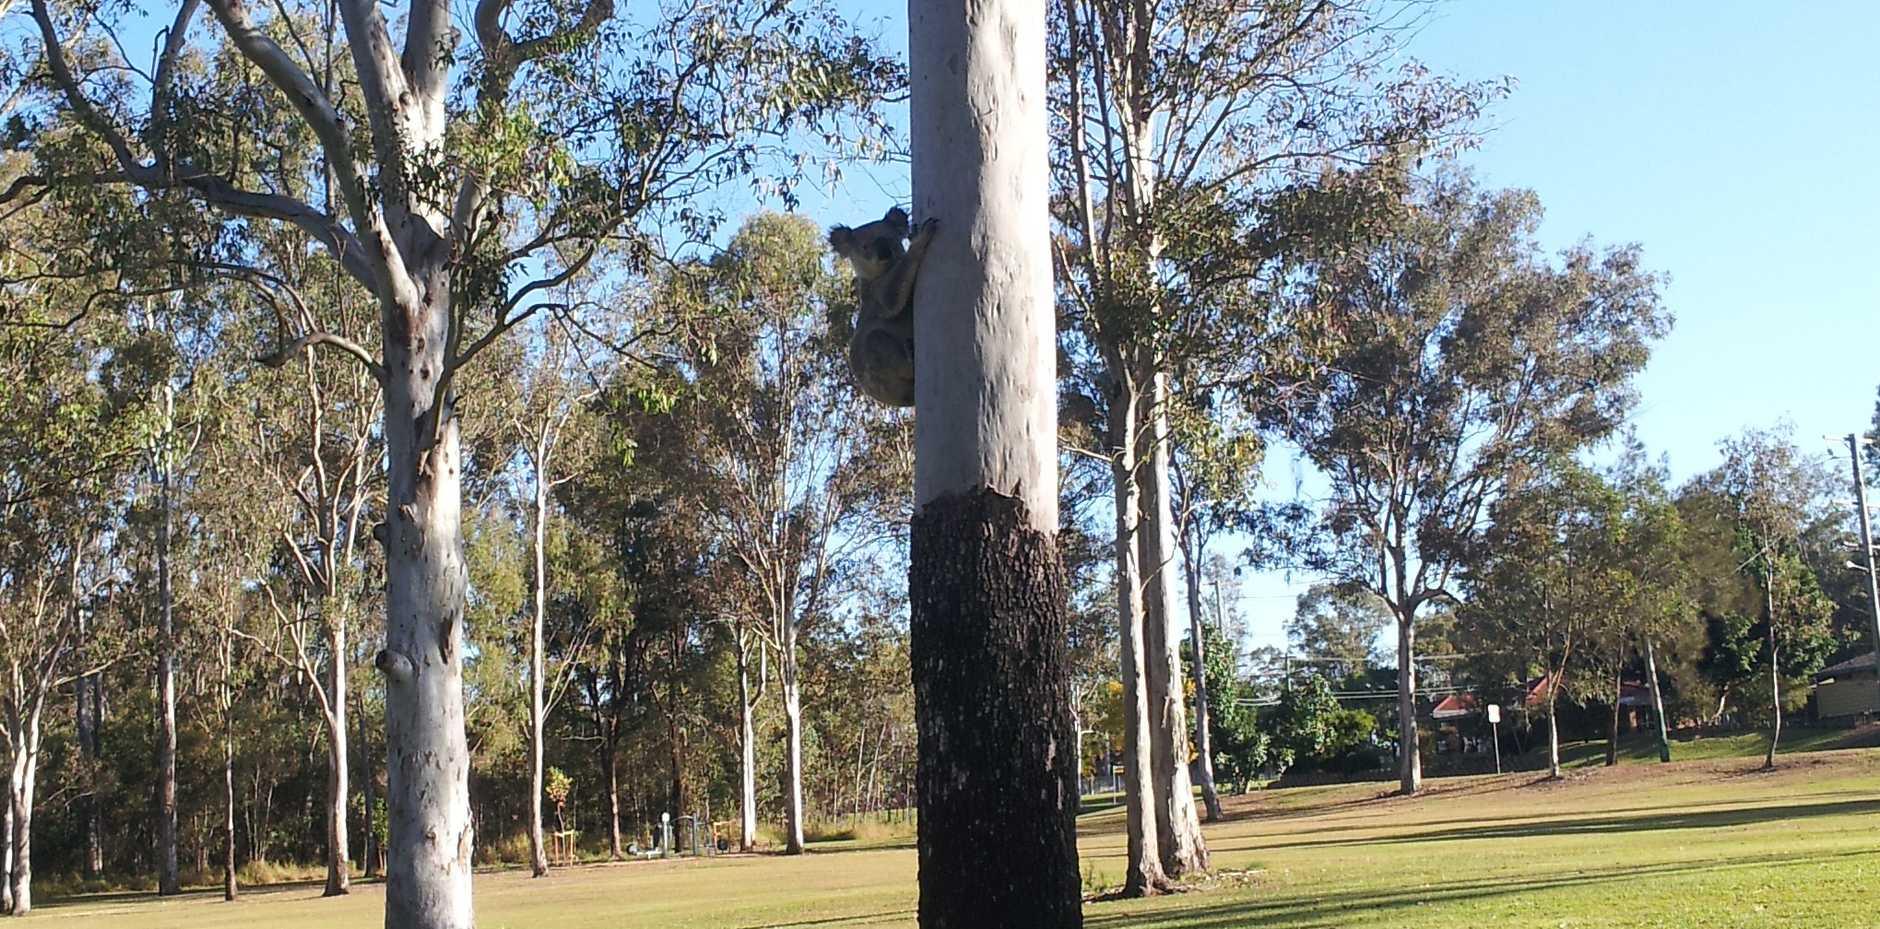 Koala in Goupong Park, Collingwood Park